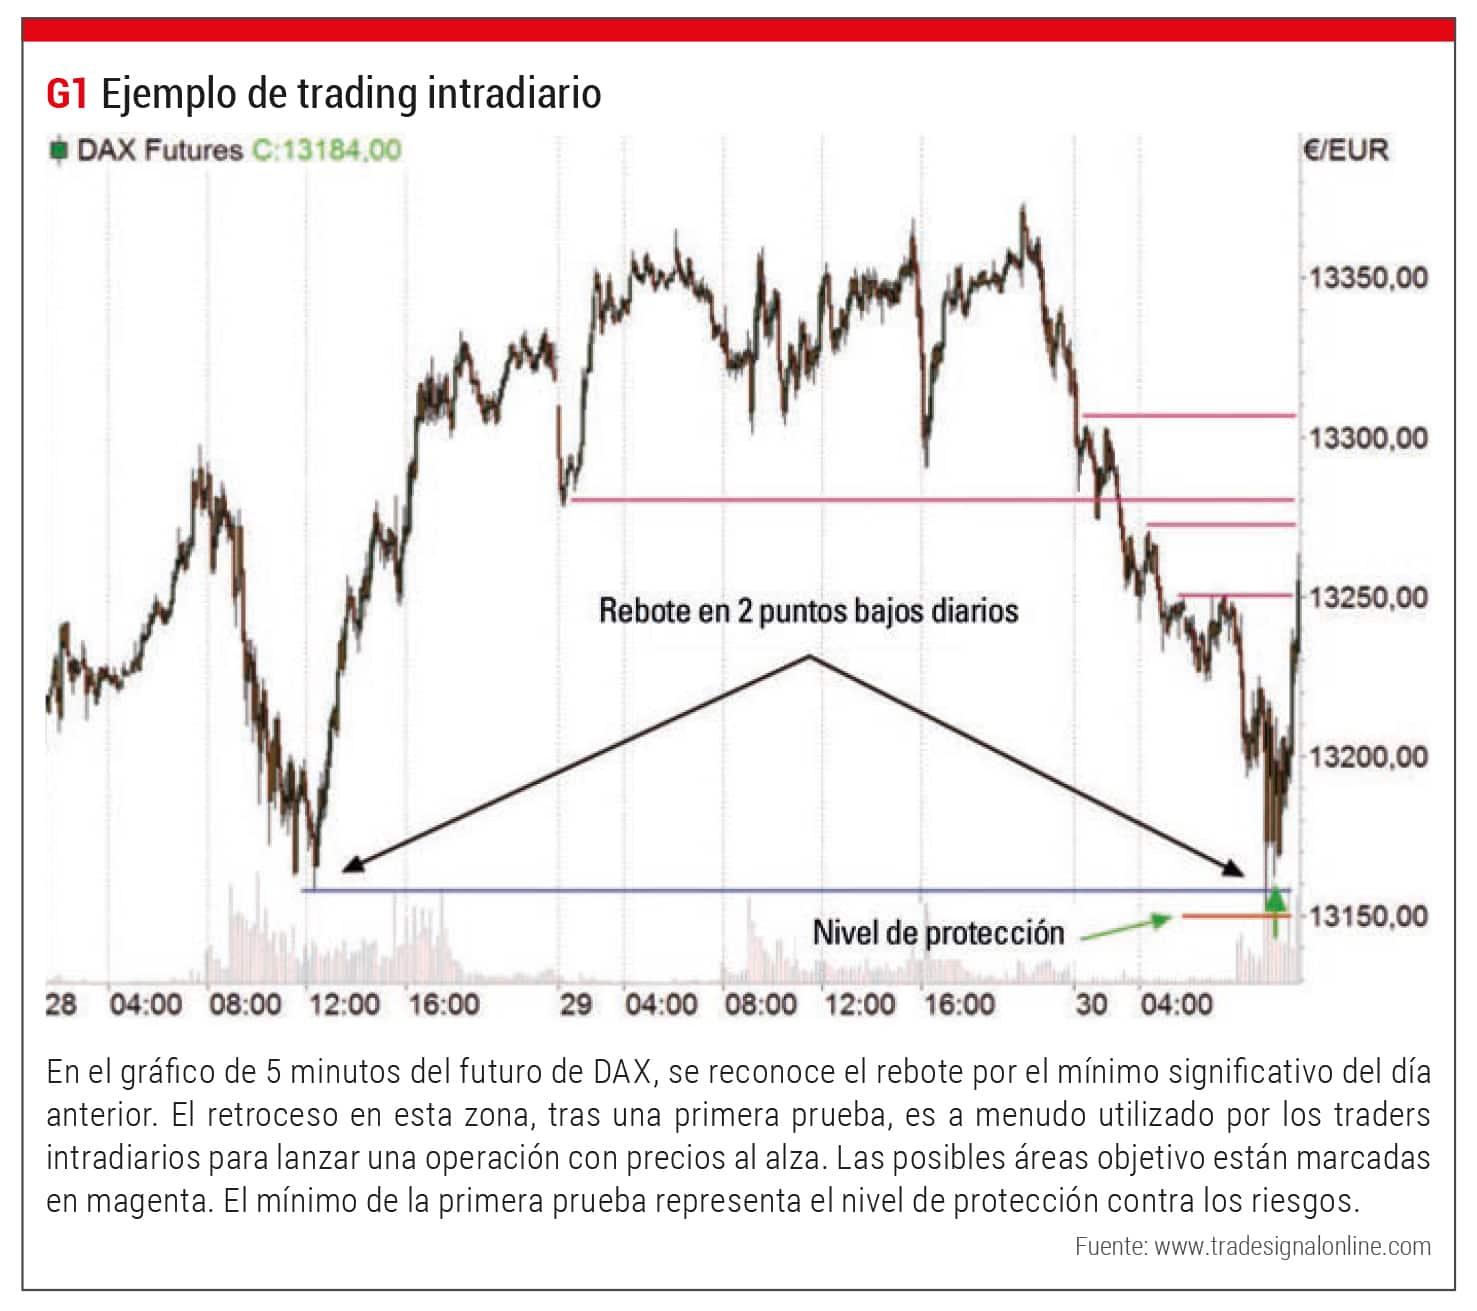 Trading Intradiario